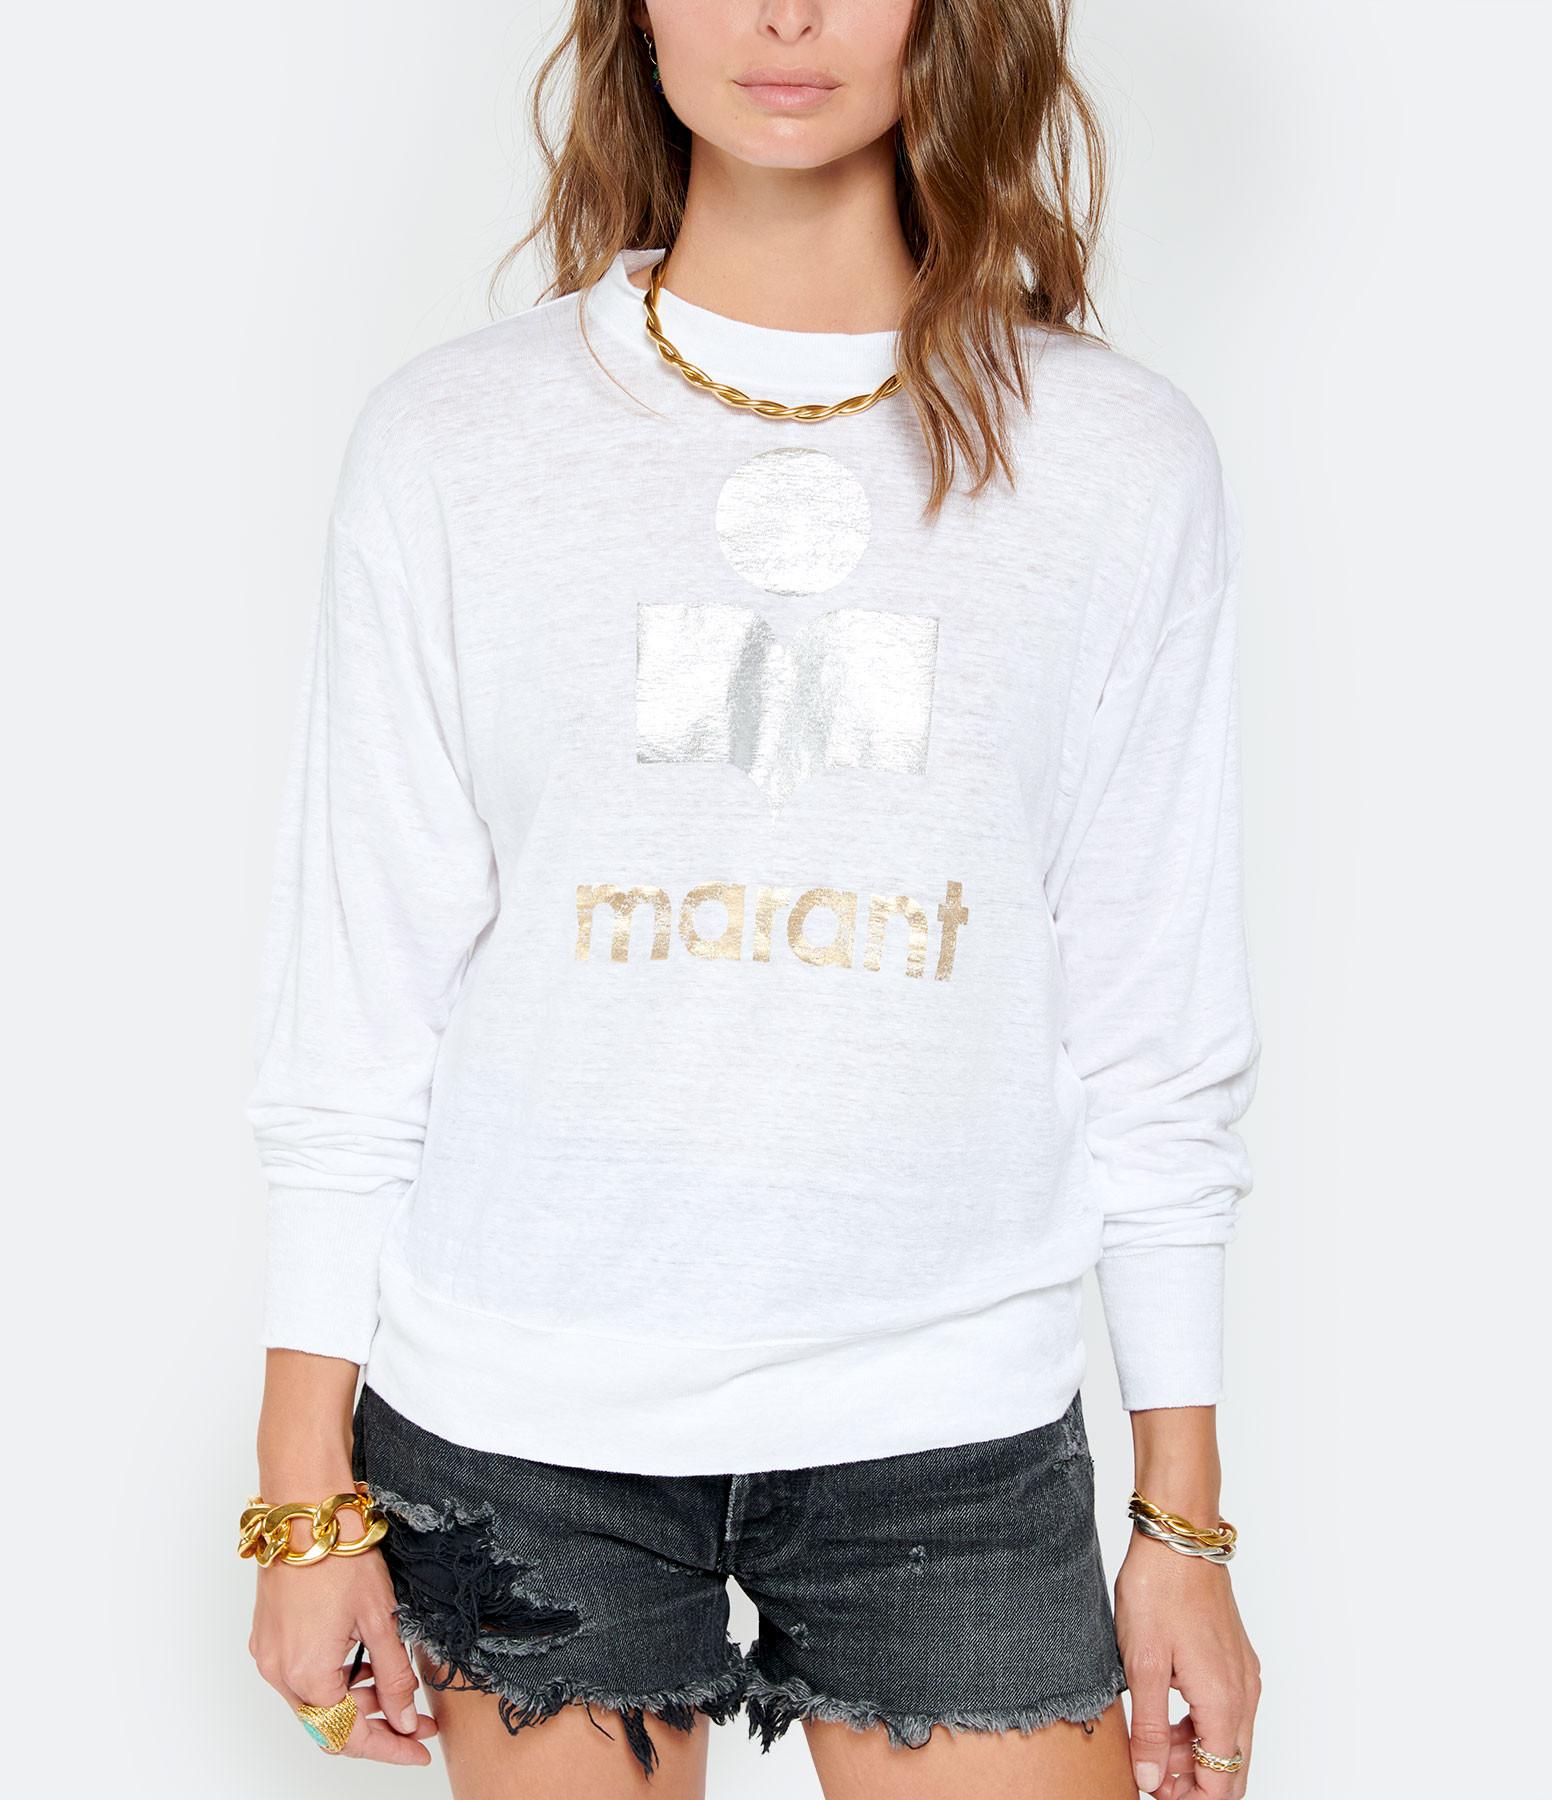 ISABEL MARANT ÉTOILE - Tee-shirt Klowia Lin Blanc